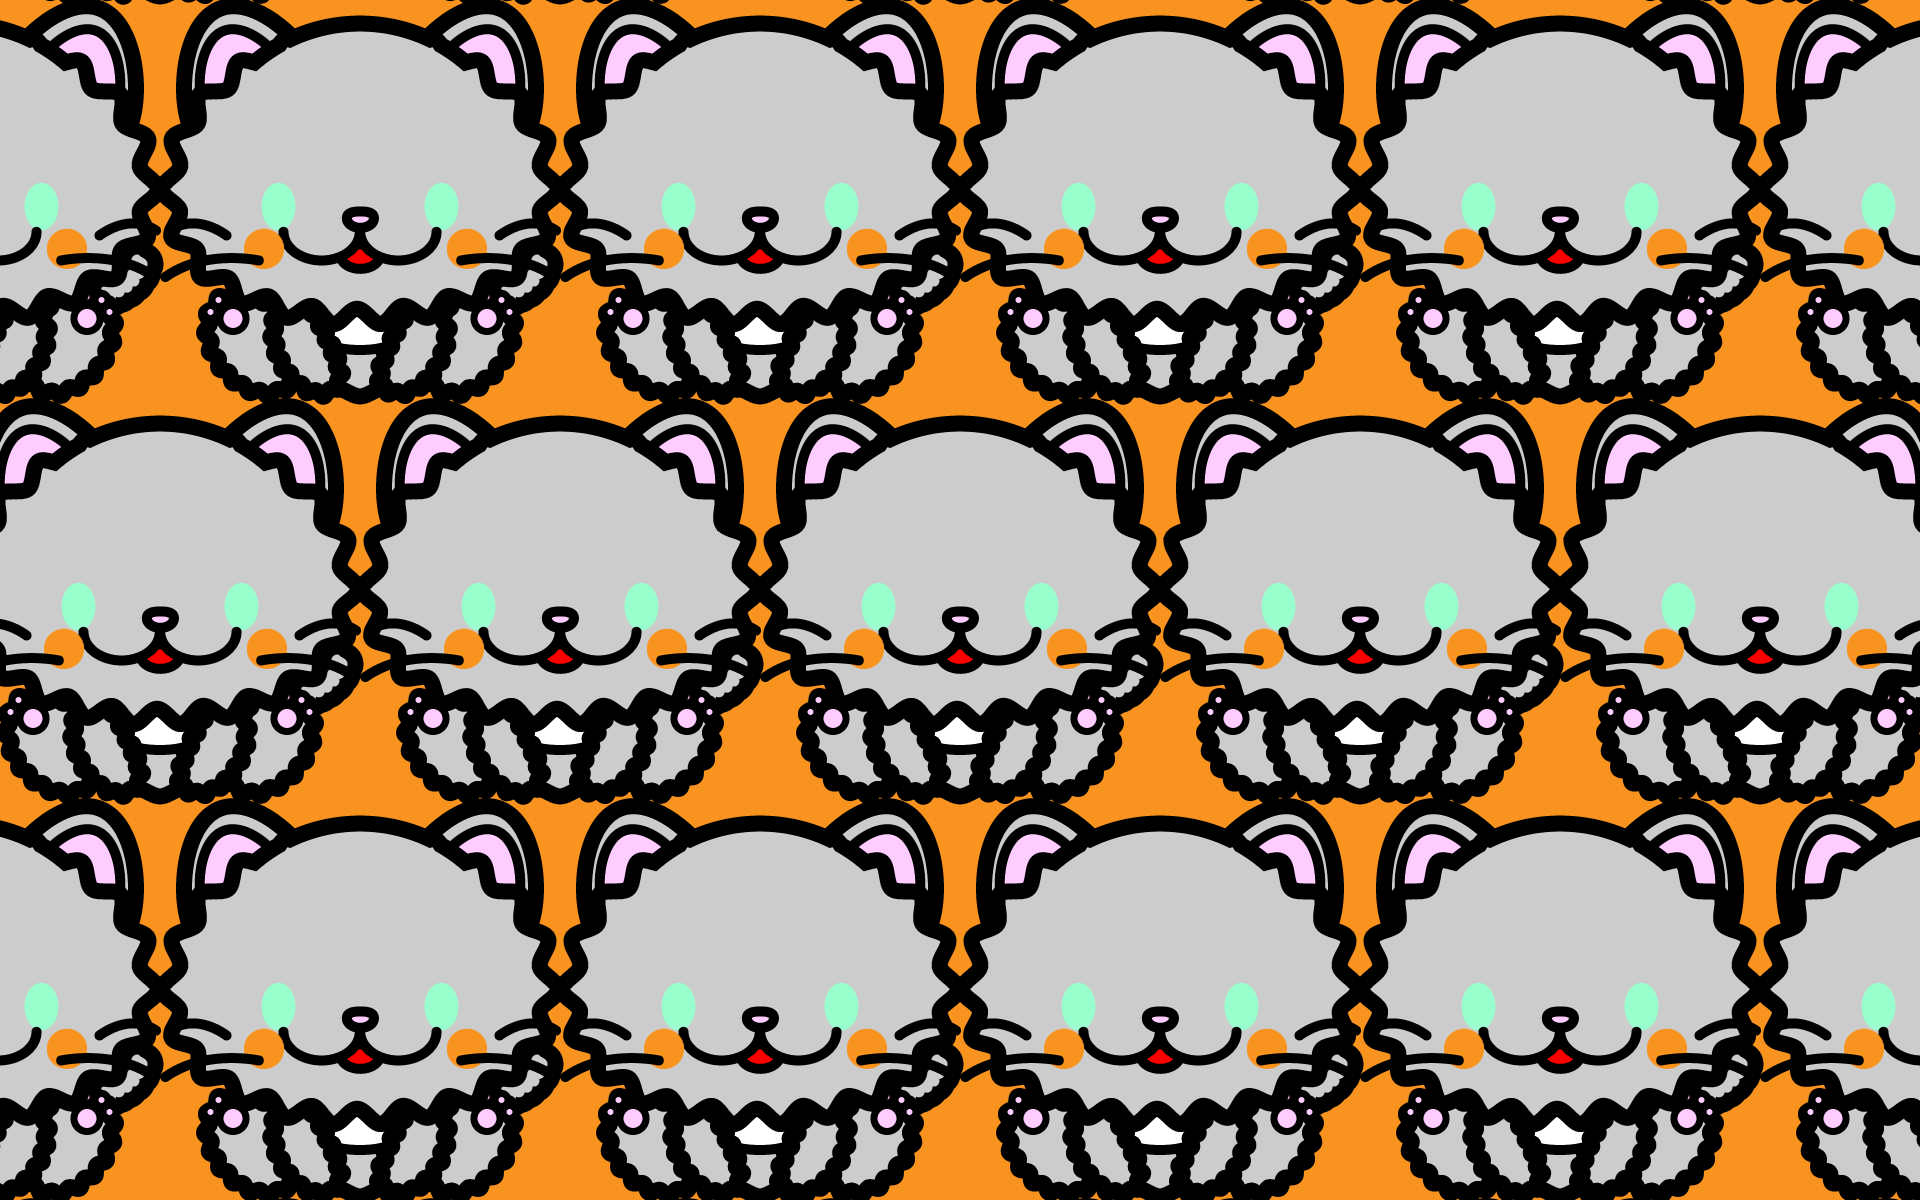 wallpaper4_sitpersiancat-fill-orange-pc